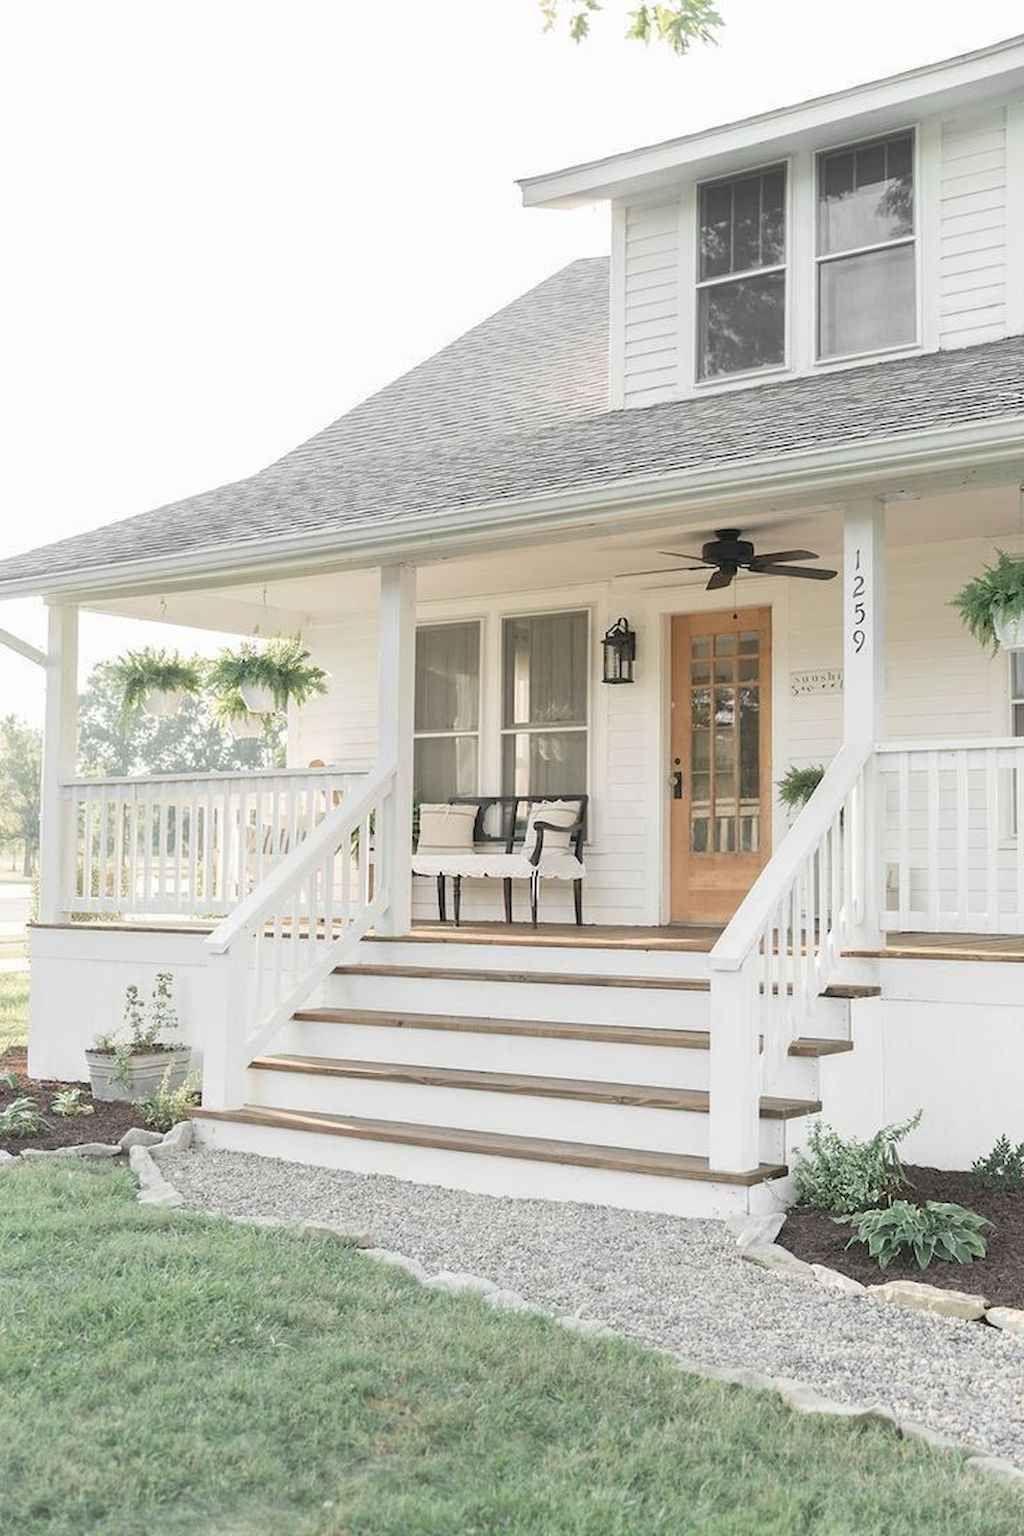 05 amazing farmhouse front porch decor ideas farmhouse on beautiful modern farmhouse trending exterior design ideas id=16279